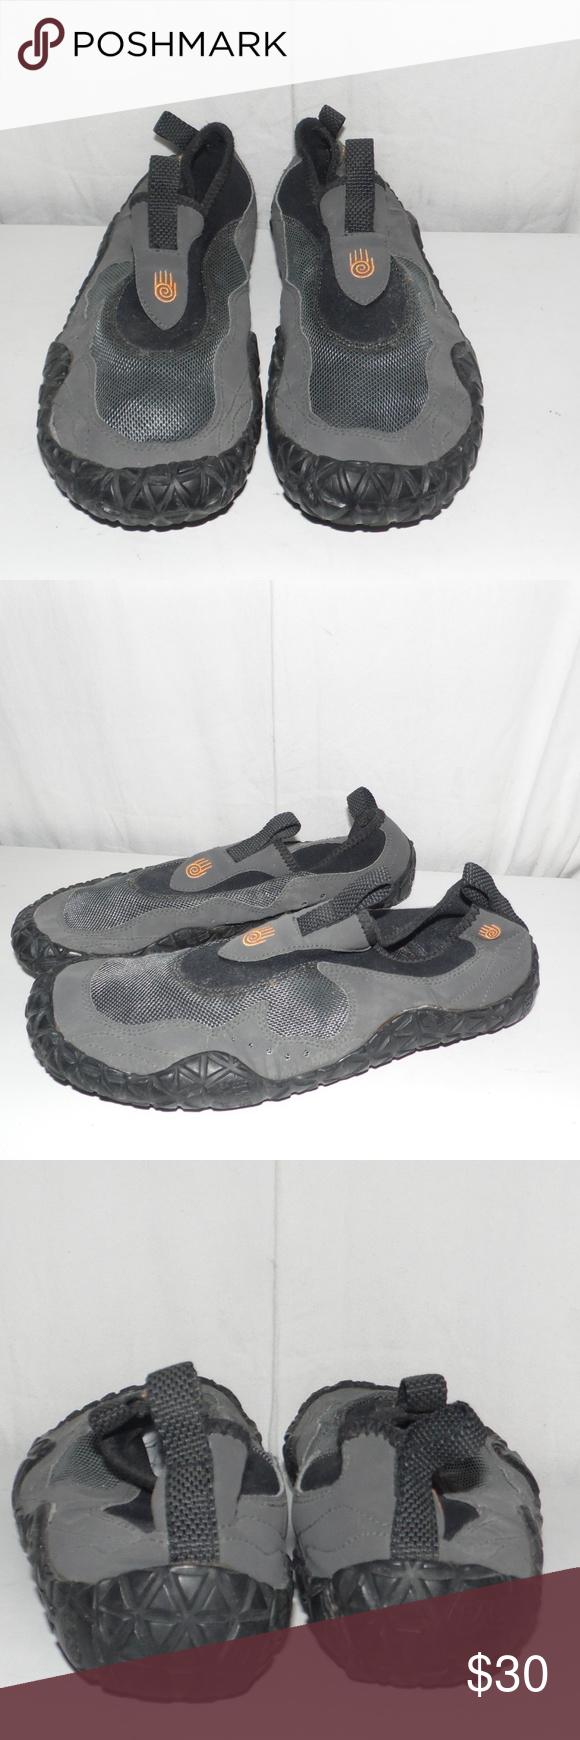 edc13d2ba529 Teva Proton 6658 Water Shoes Men s 10 very good condition Teva Proton 6658 Water  Shoes Men s Size 10 Teva Shoes